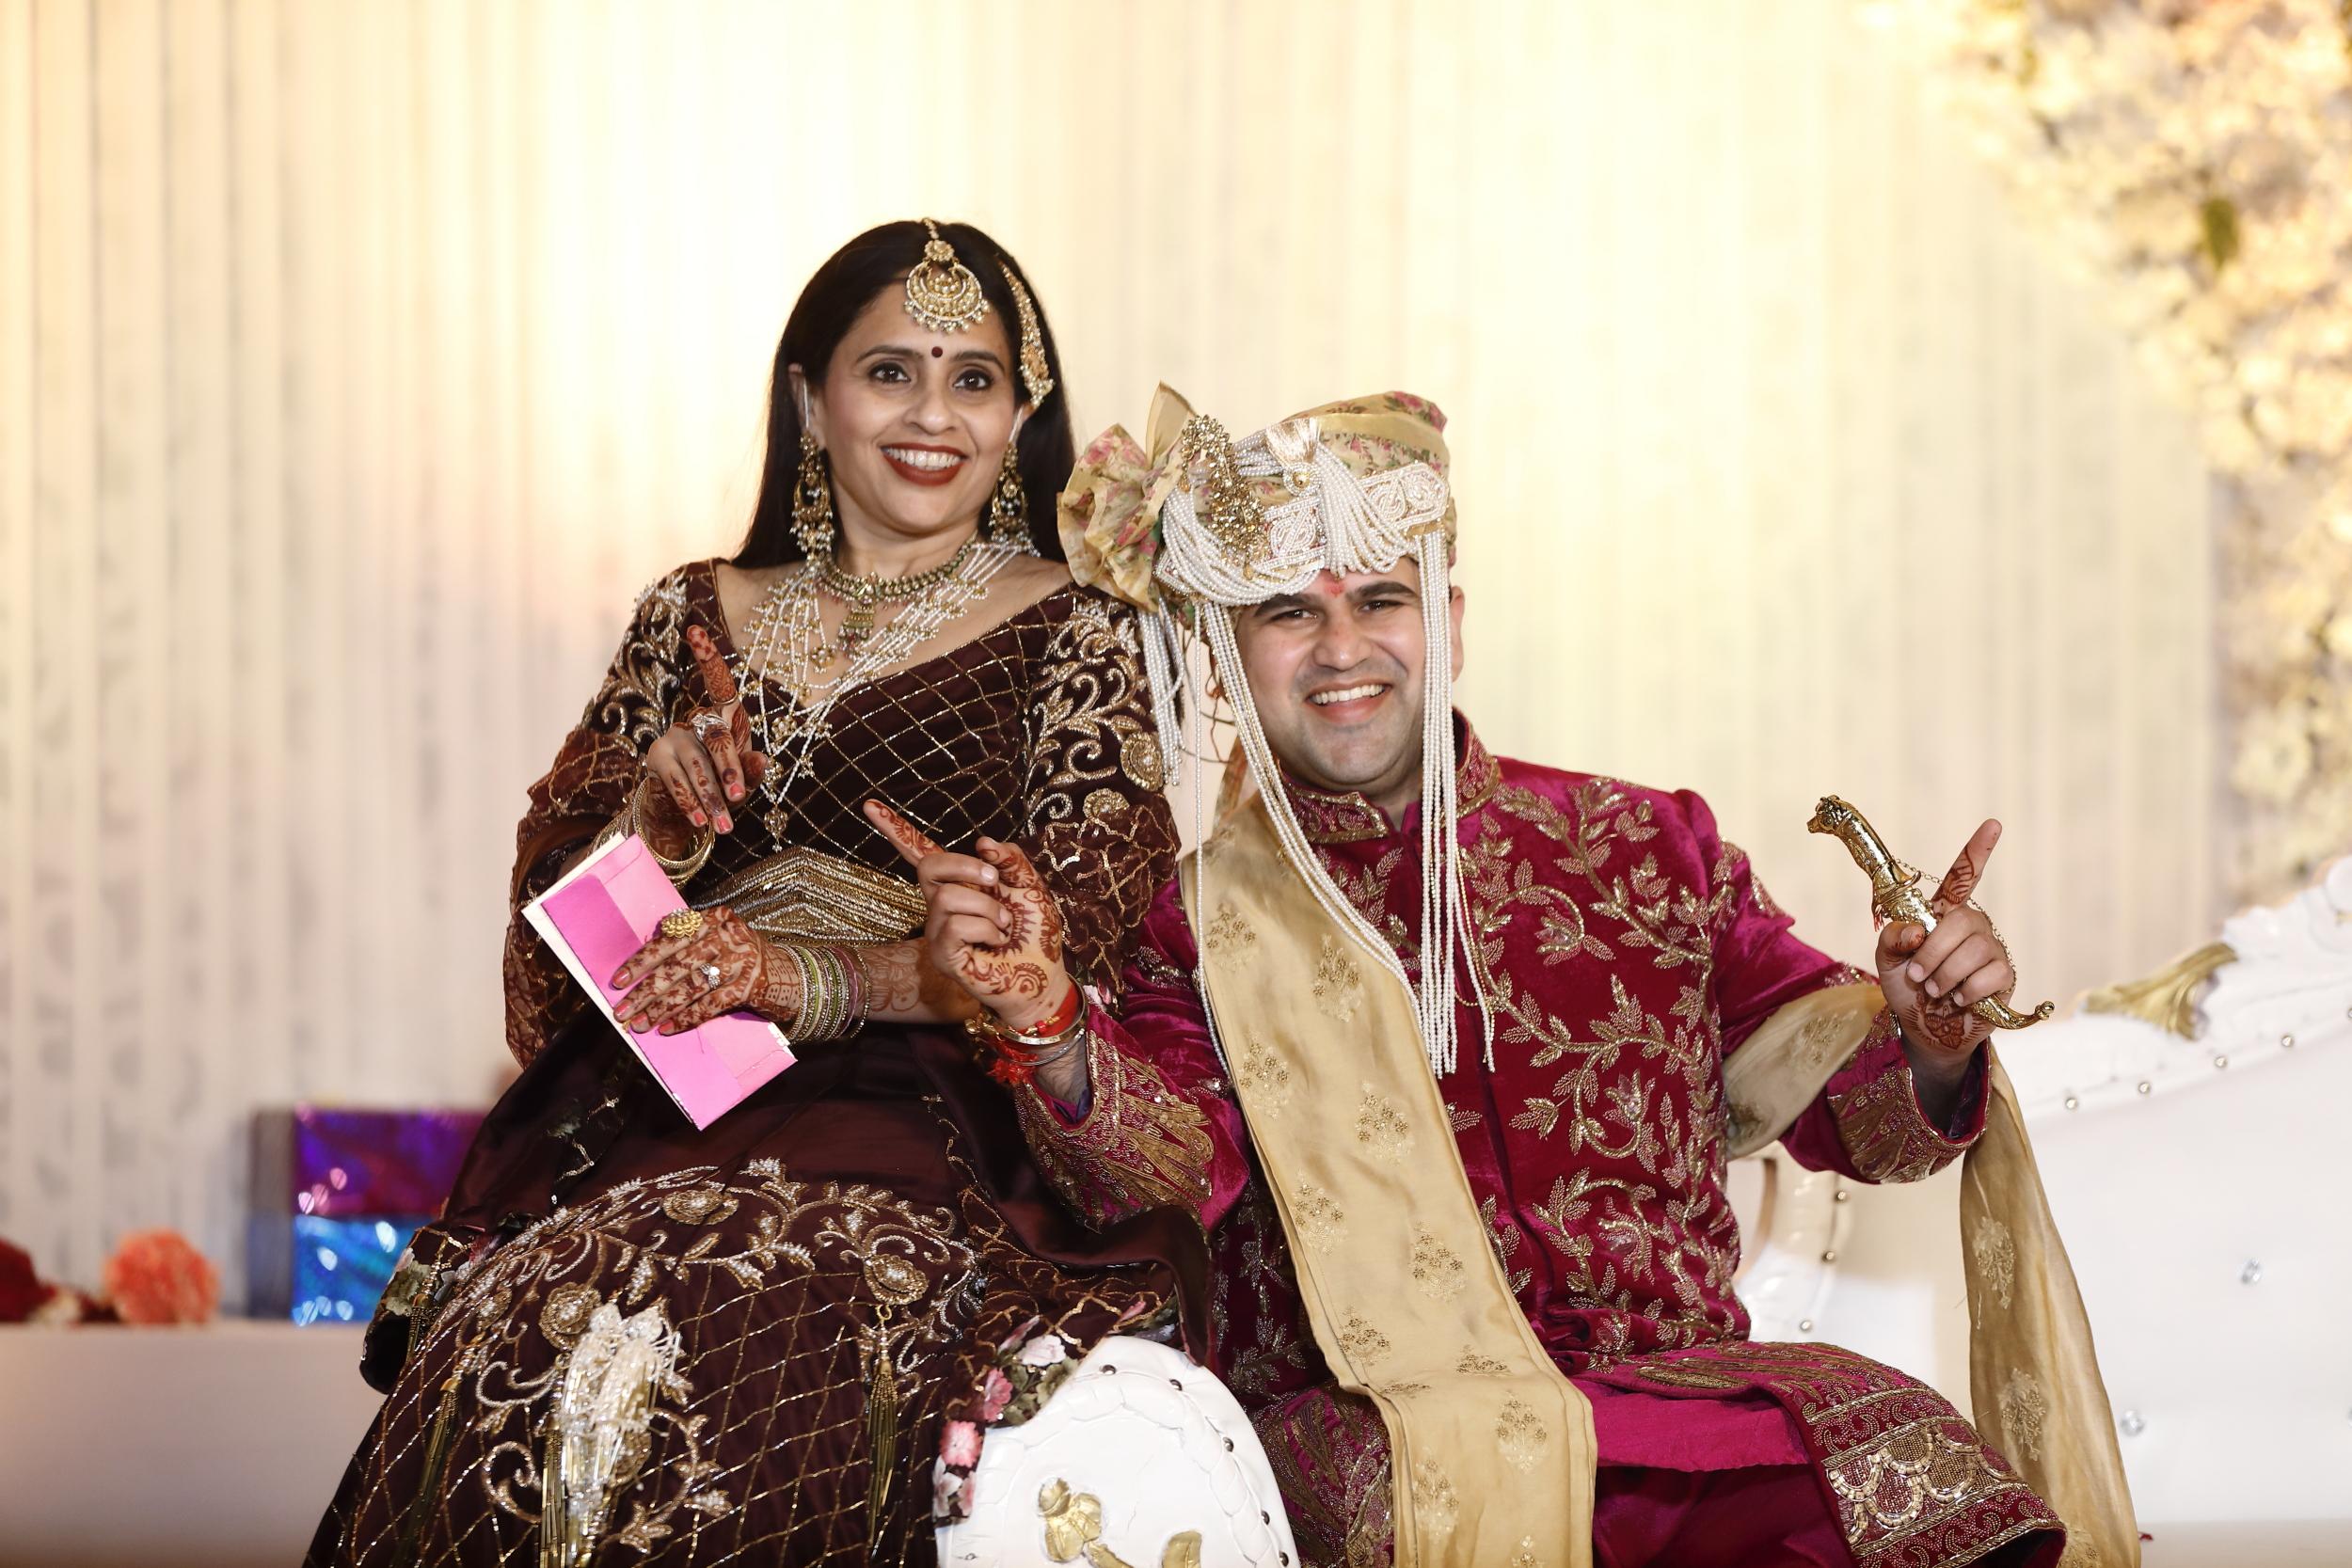 Candid wedding photographersC69A0769 Delhi